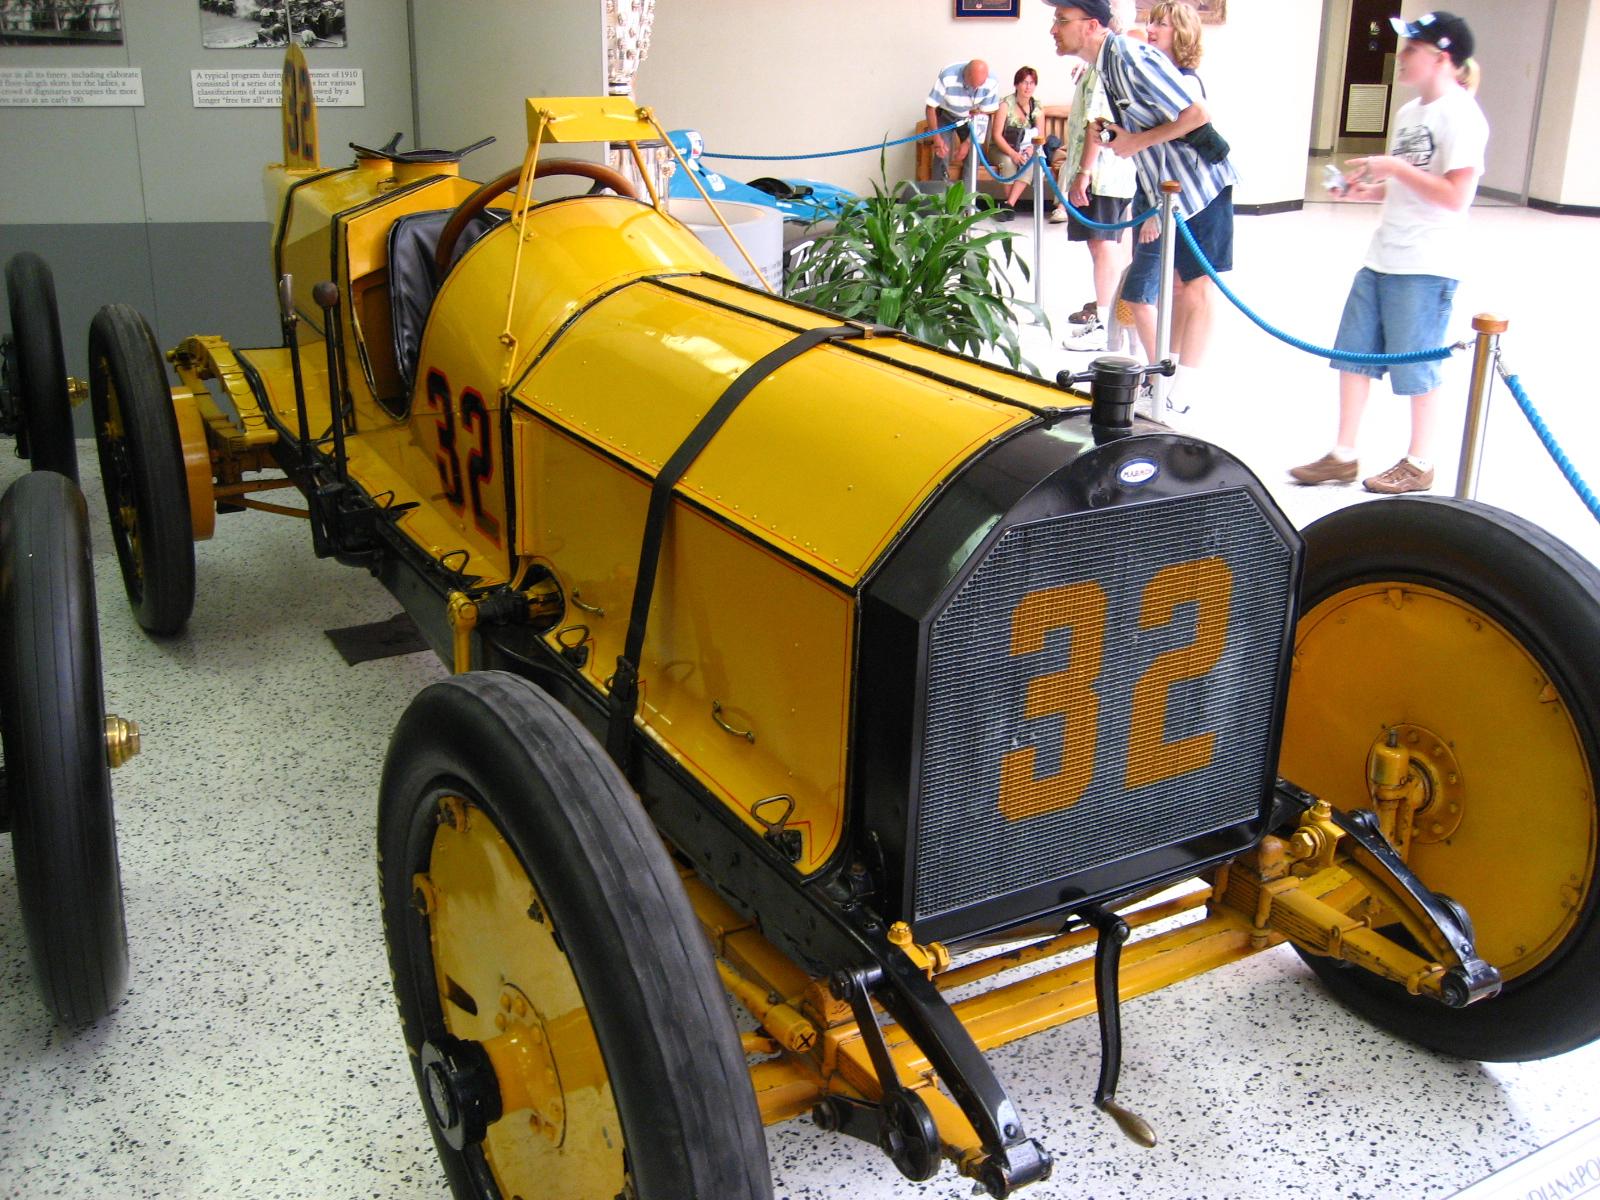 Ray Harroun's Marmon Wasp which won the 1911 Indianapolis 500